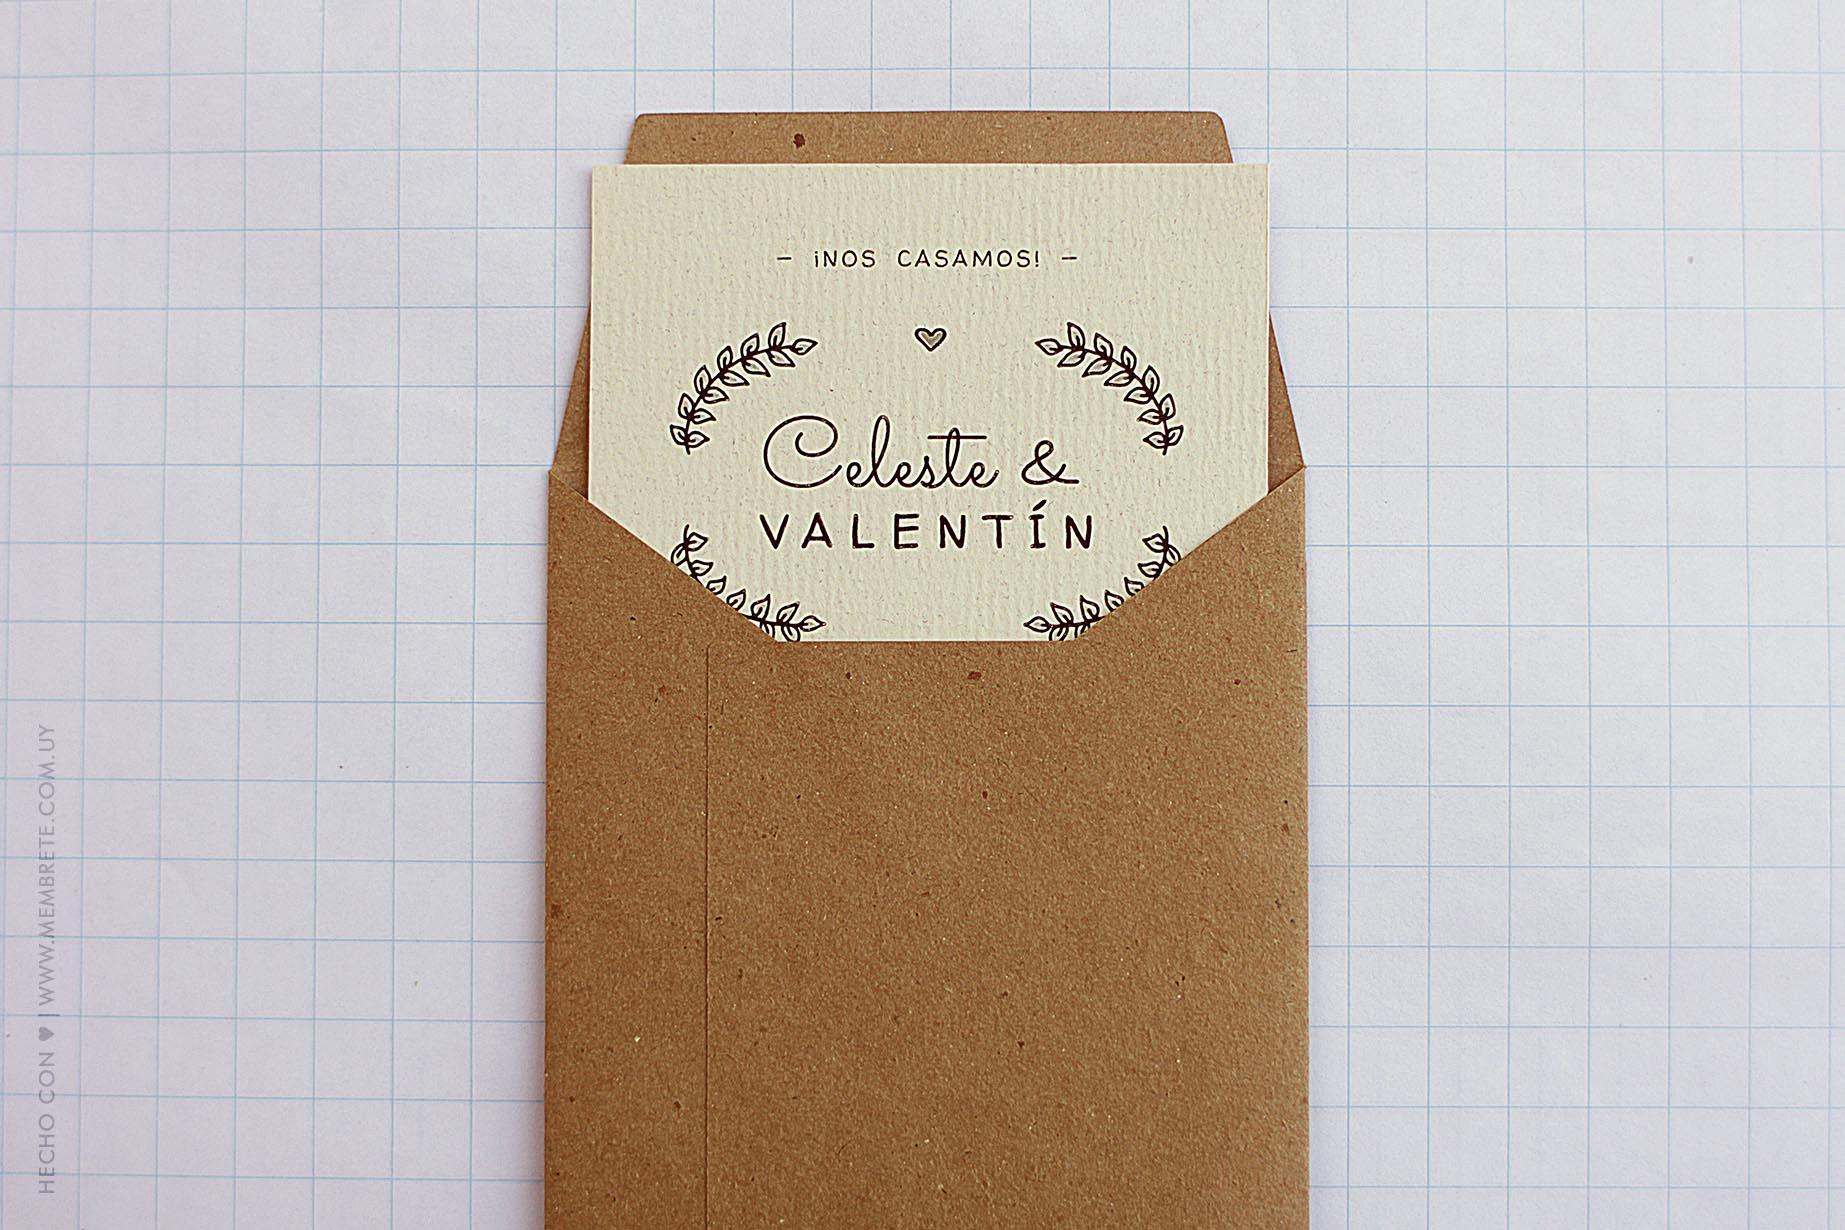 CELESTE & VALENTÍN - Membrete - www.membrete.com.uy